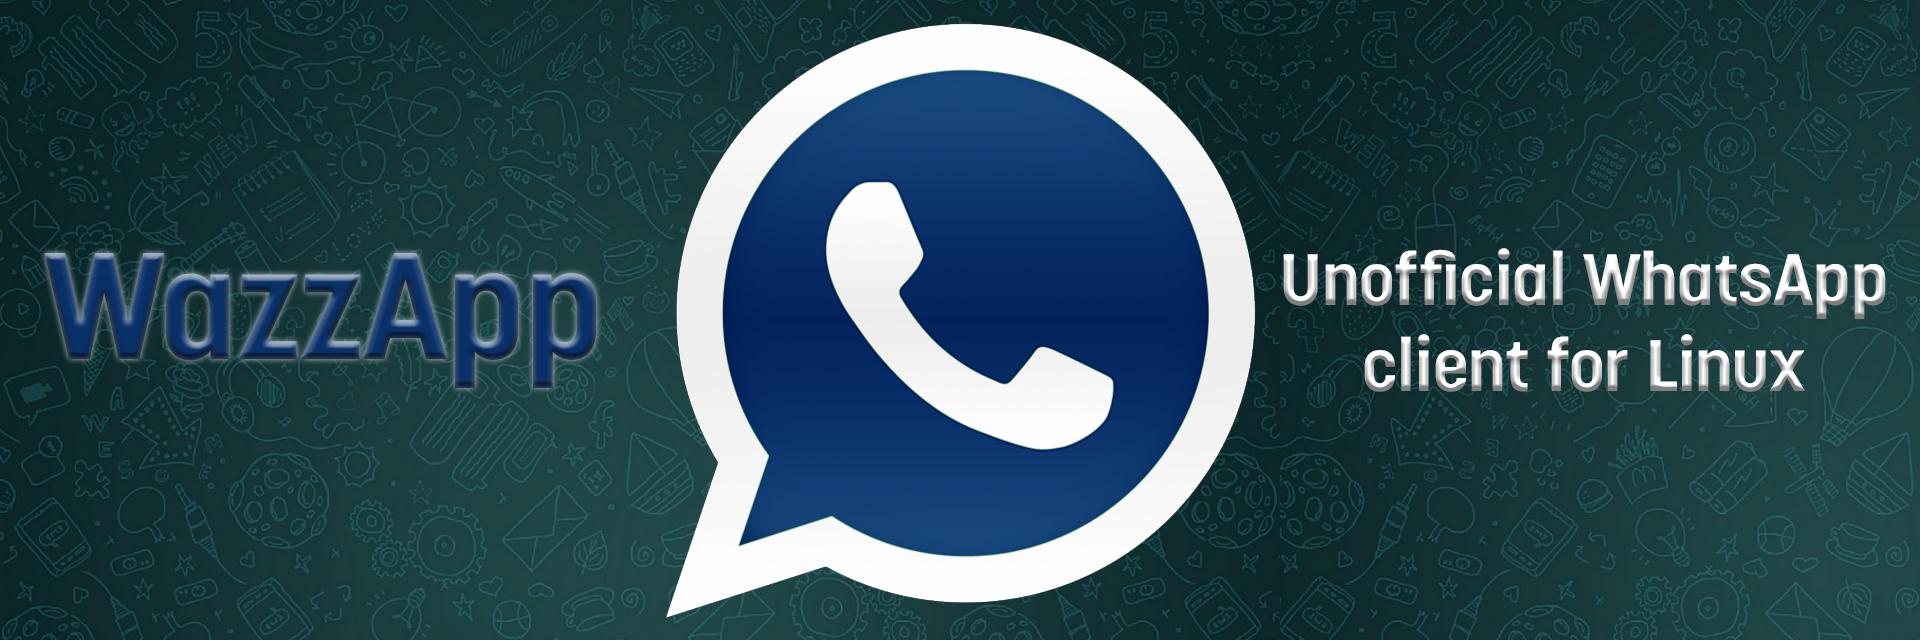 WazzApp banner